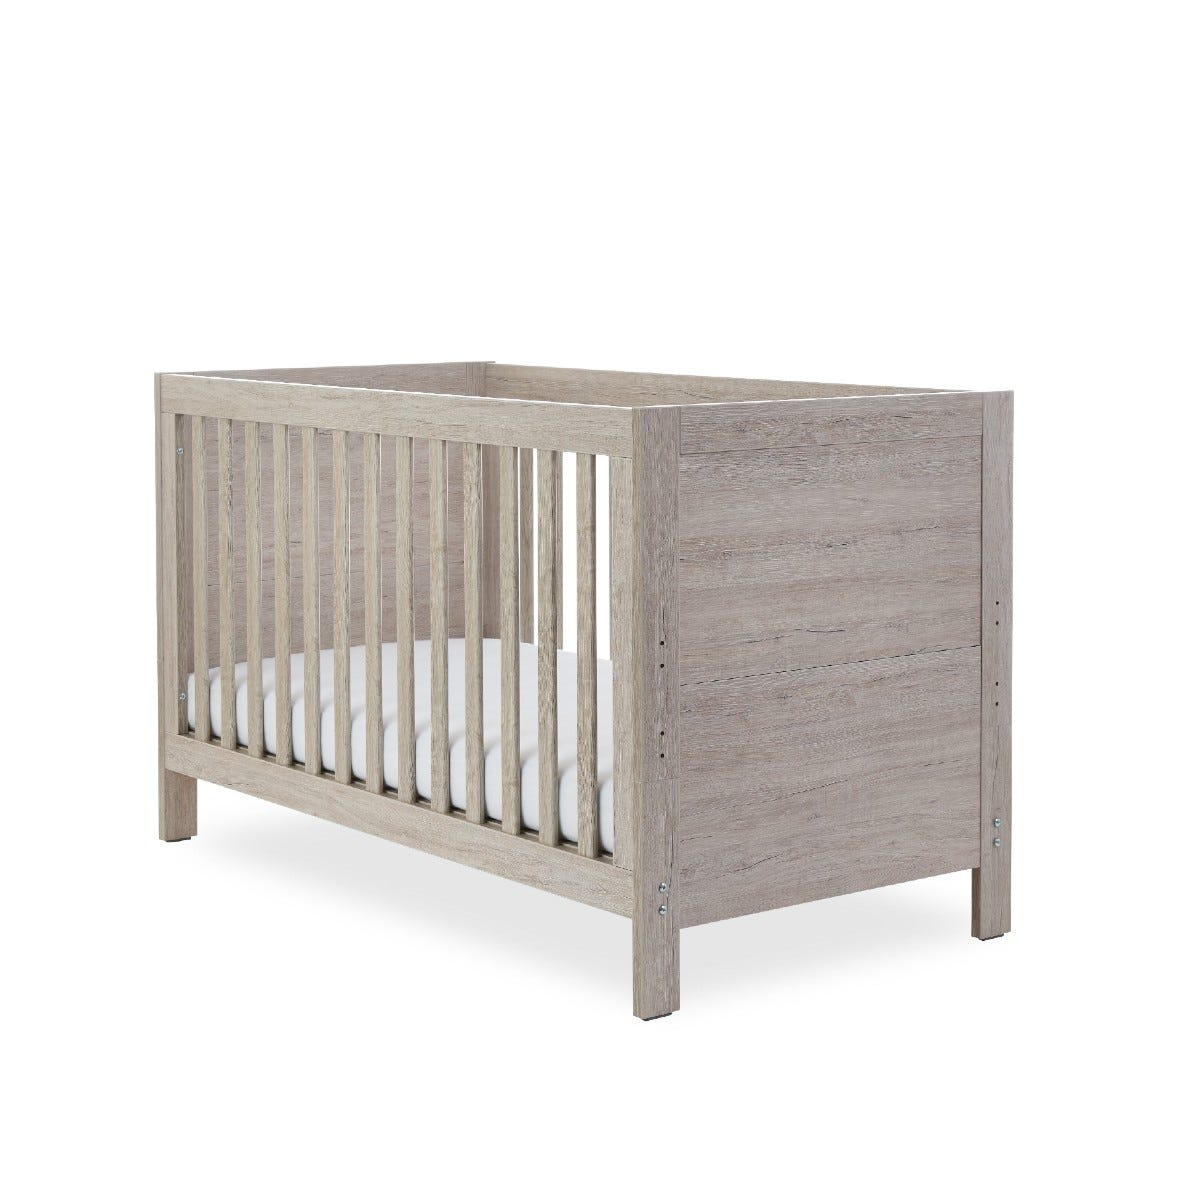 Ickle Bubba Grantham Cot Bed & Sprung Mattress Grey Oak